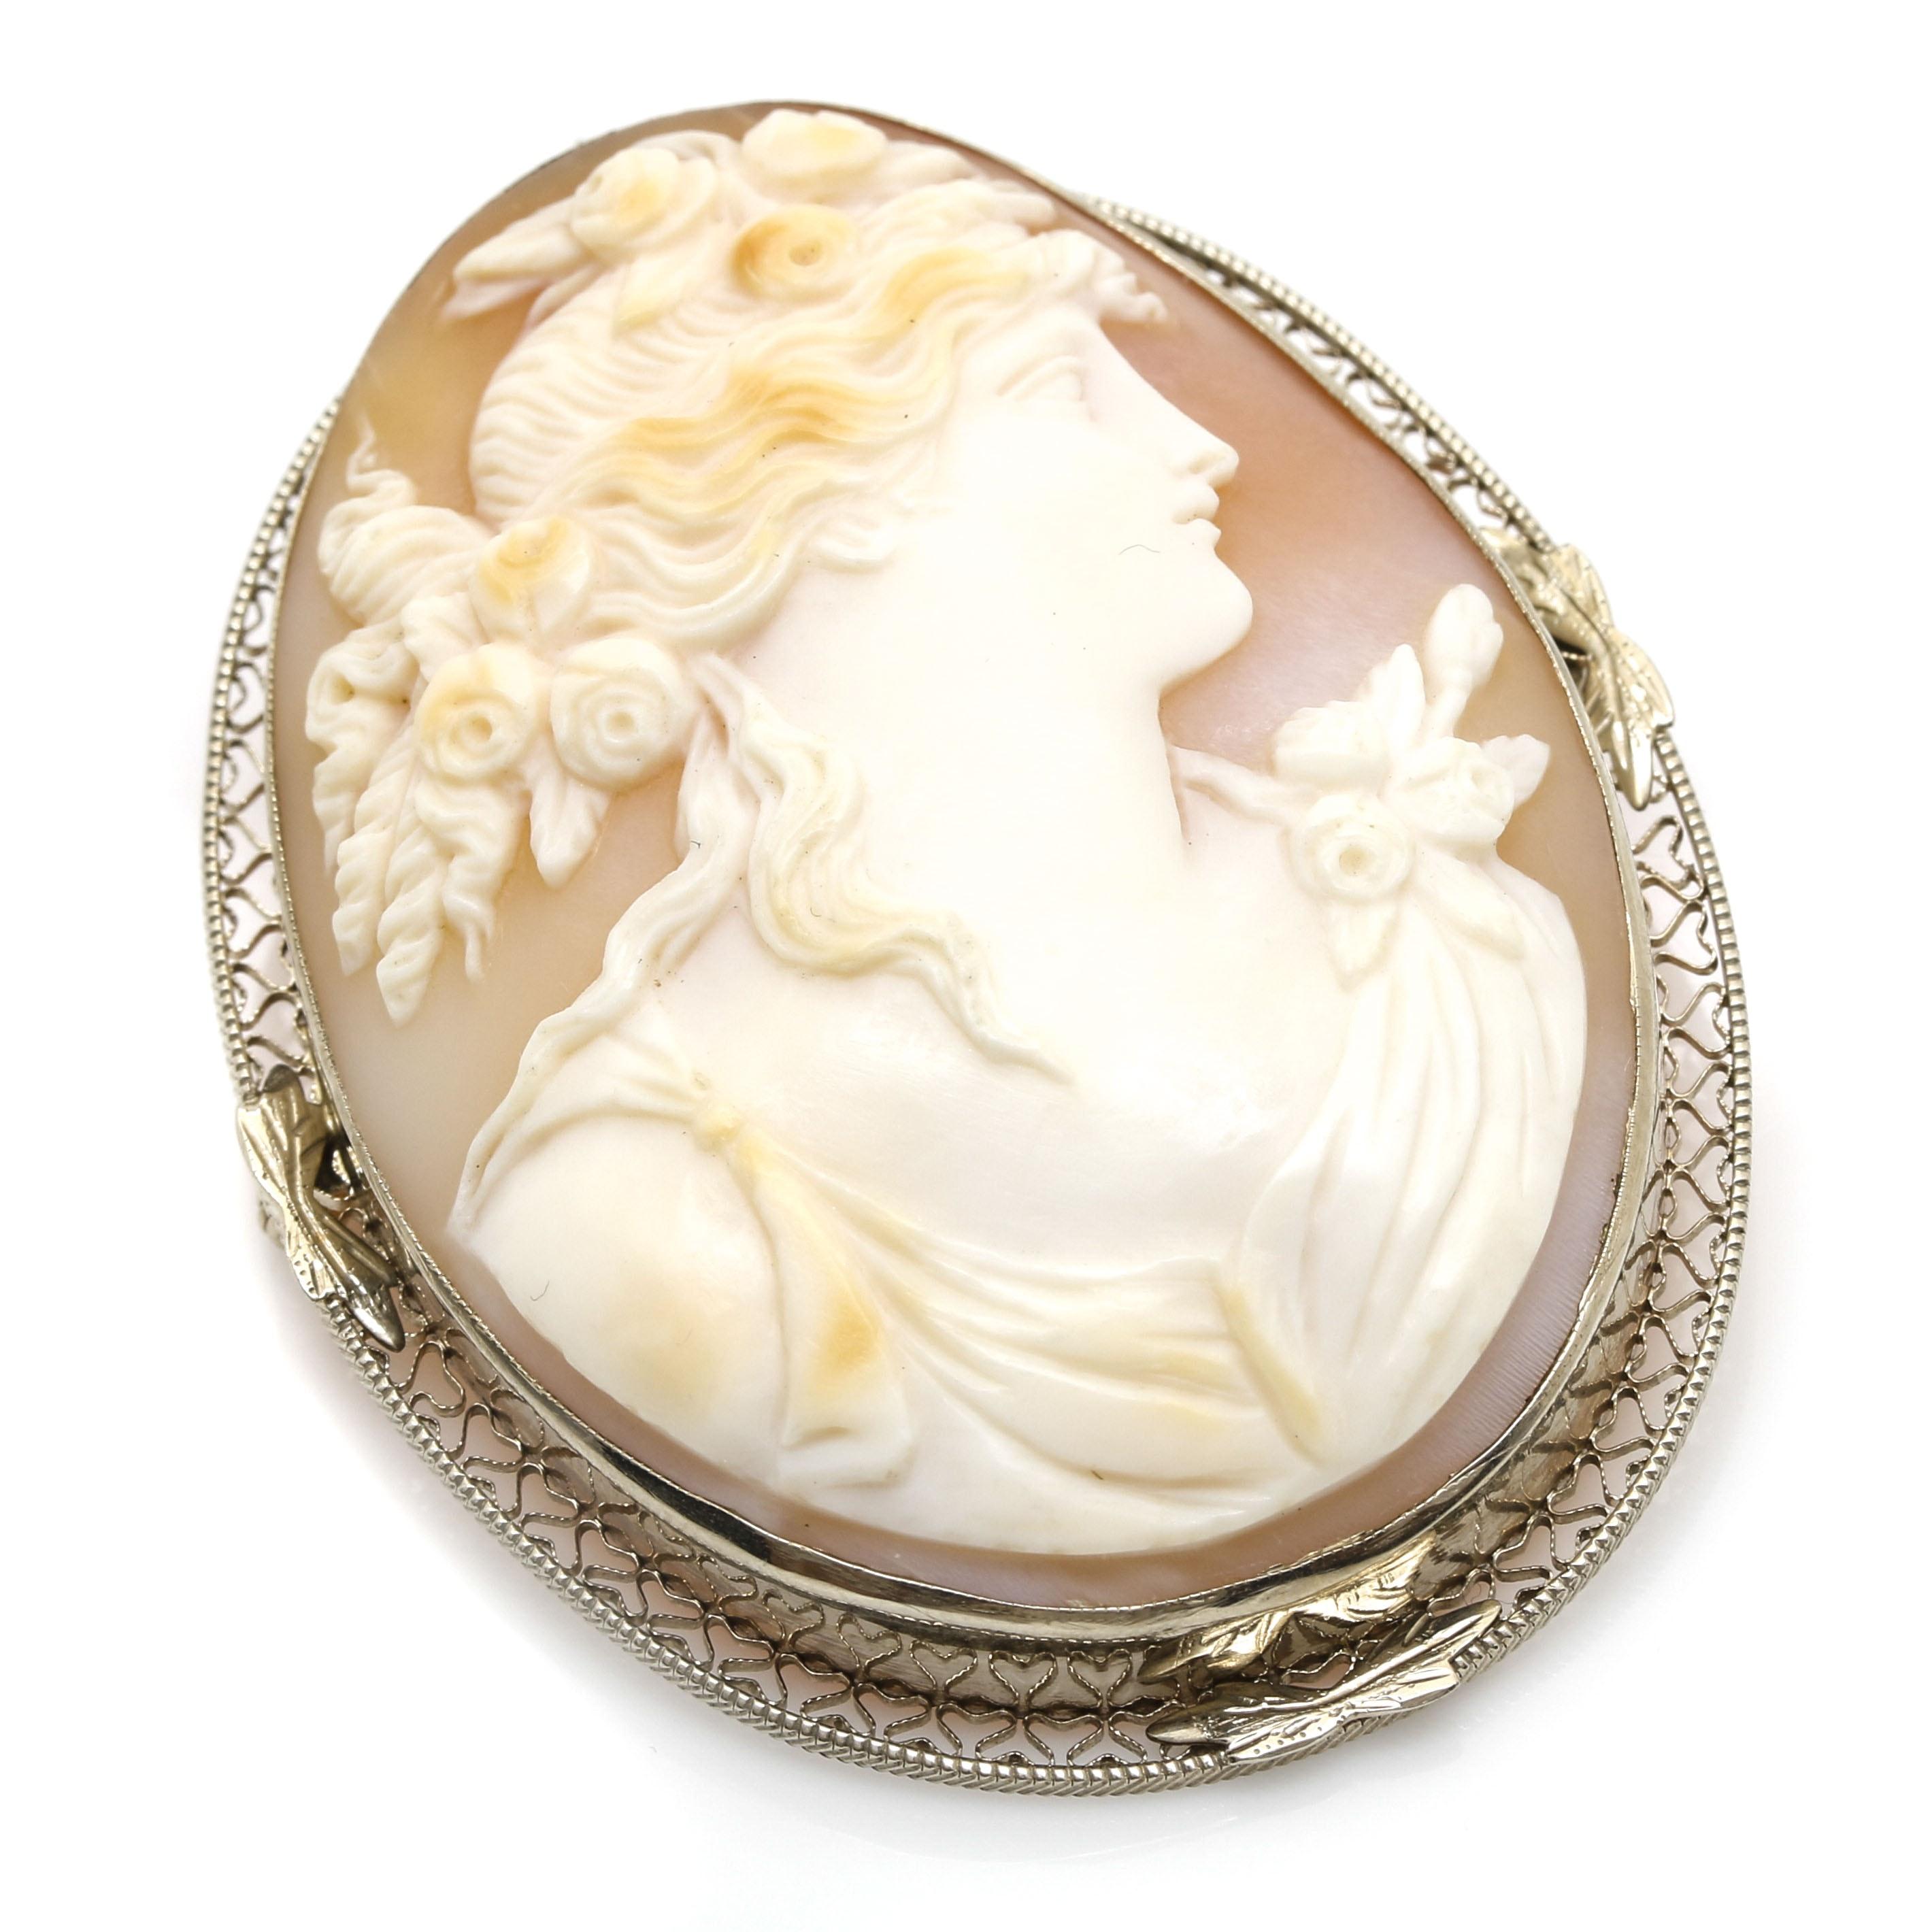 14K White Gold Shell Cameo Pendant Brooch